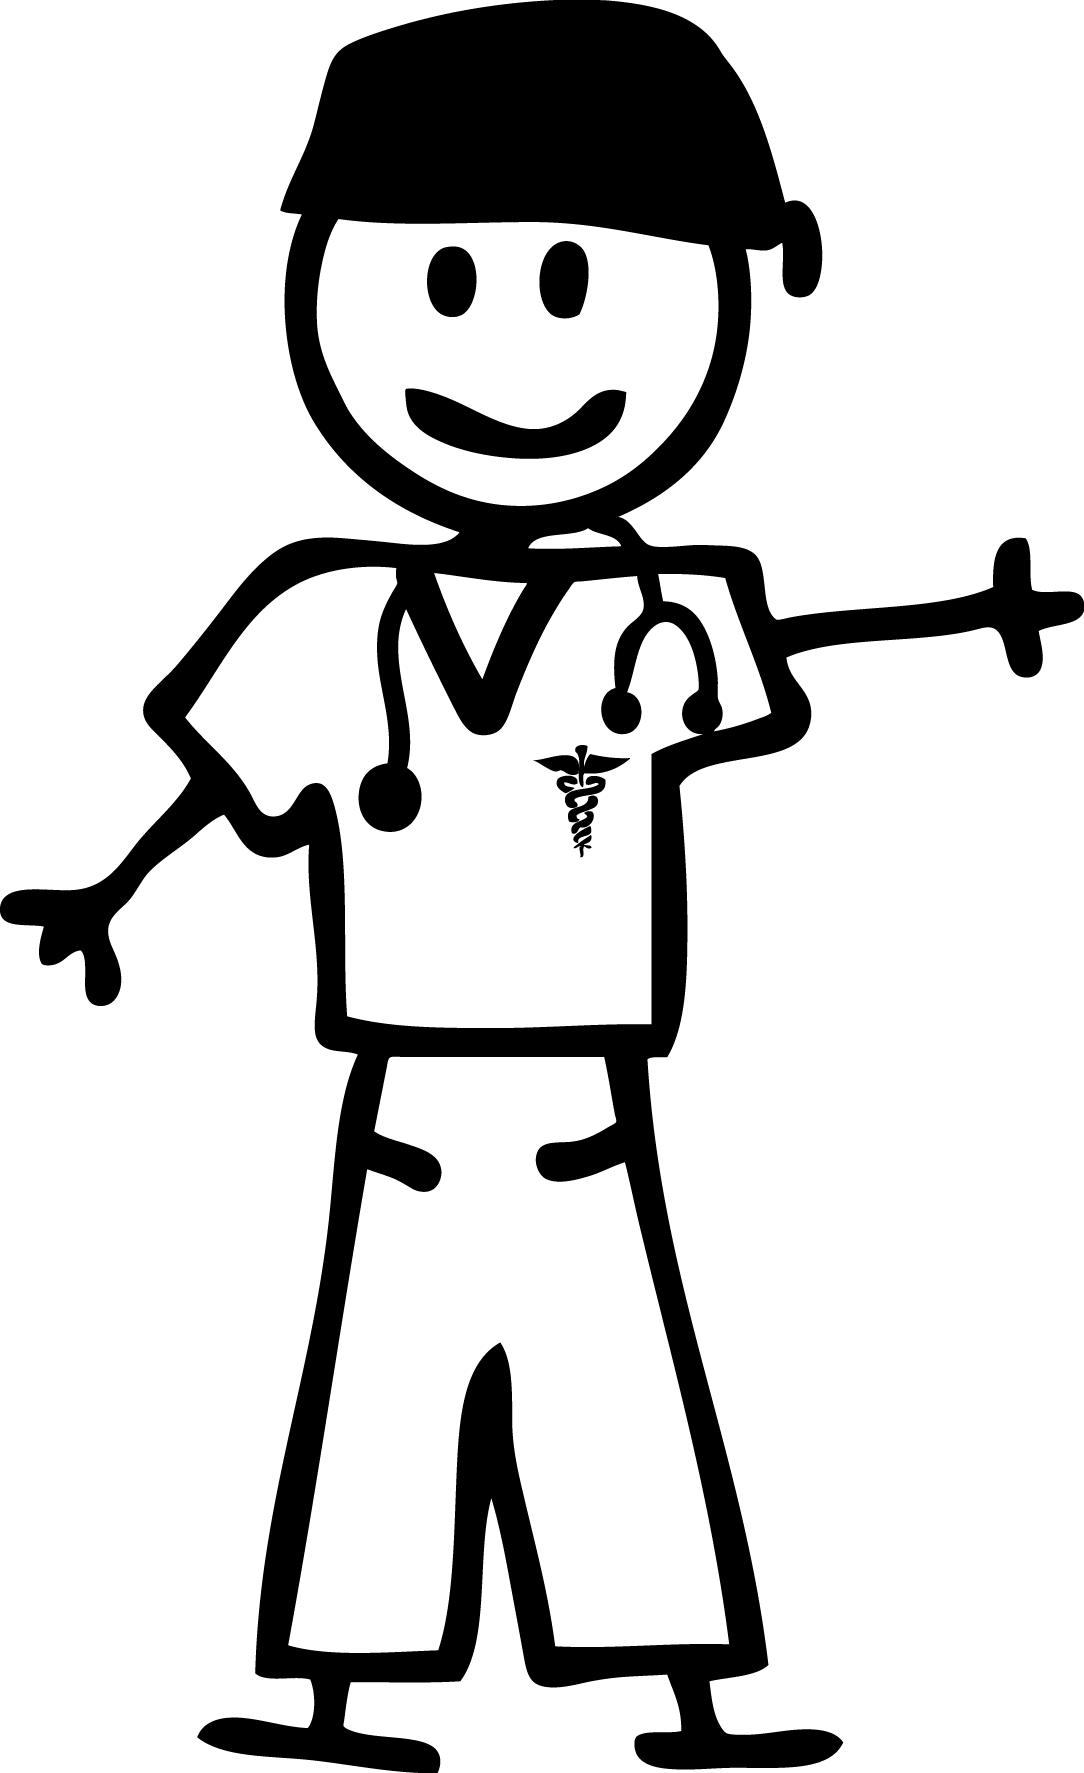 Stick Man Picture